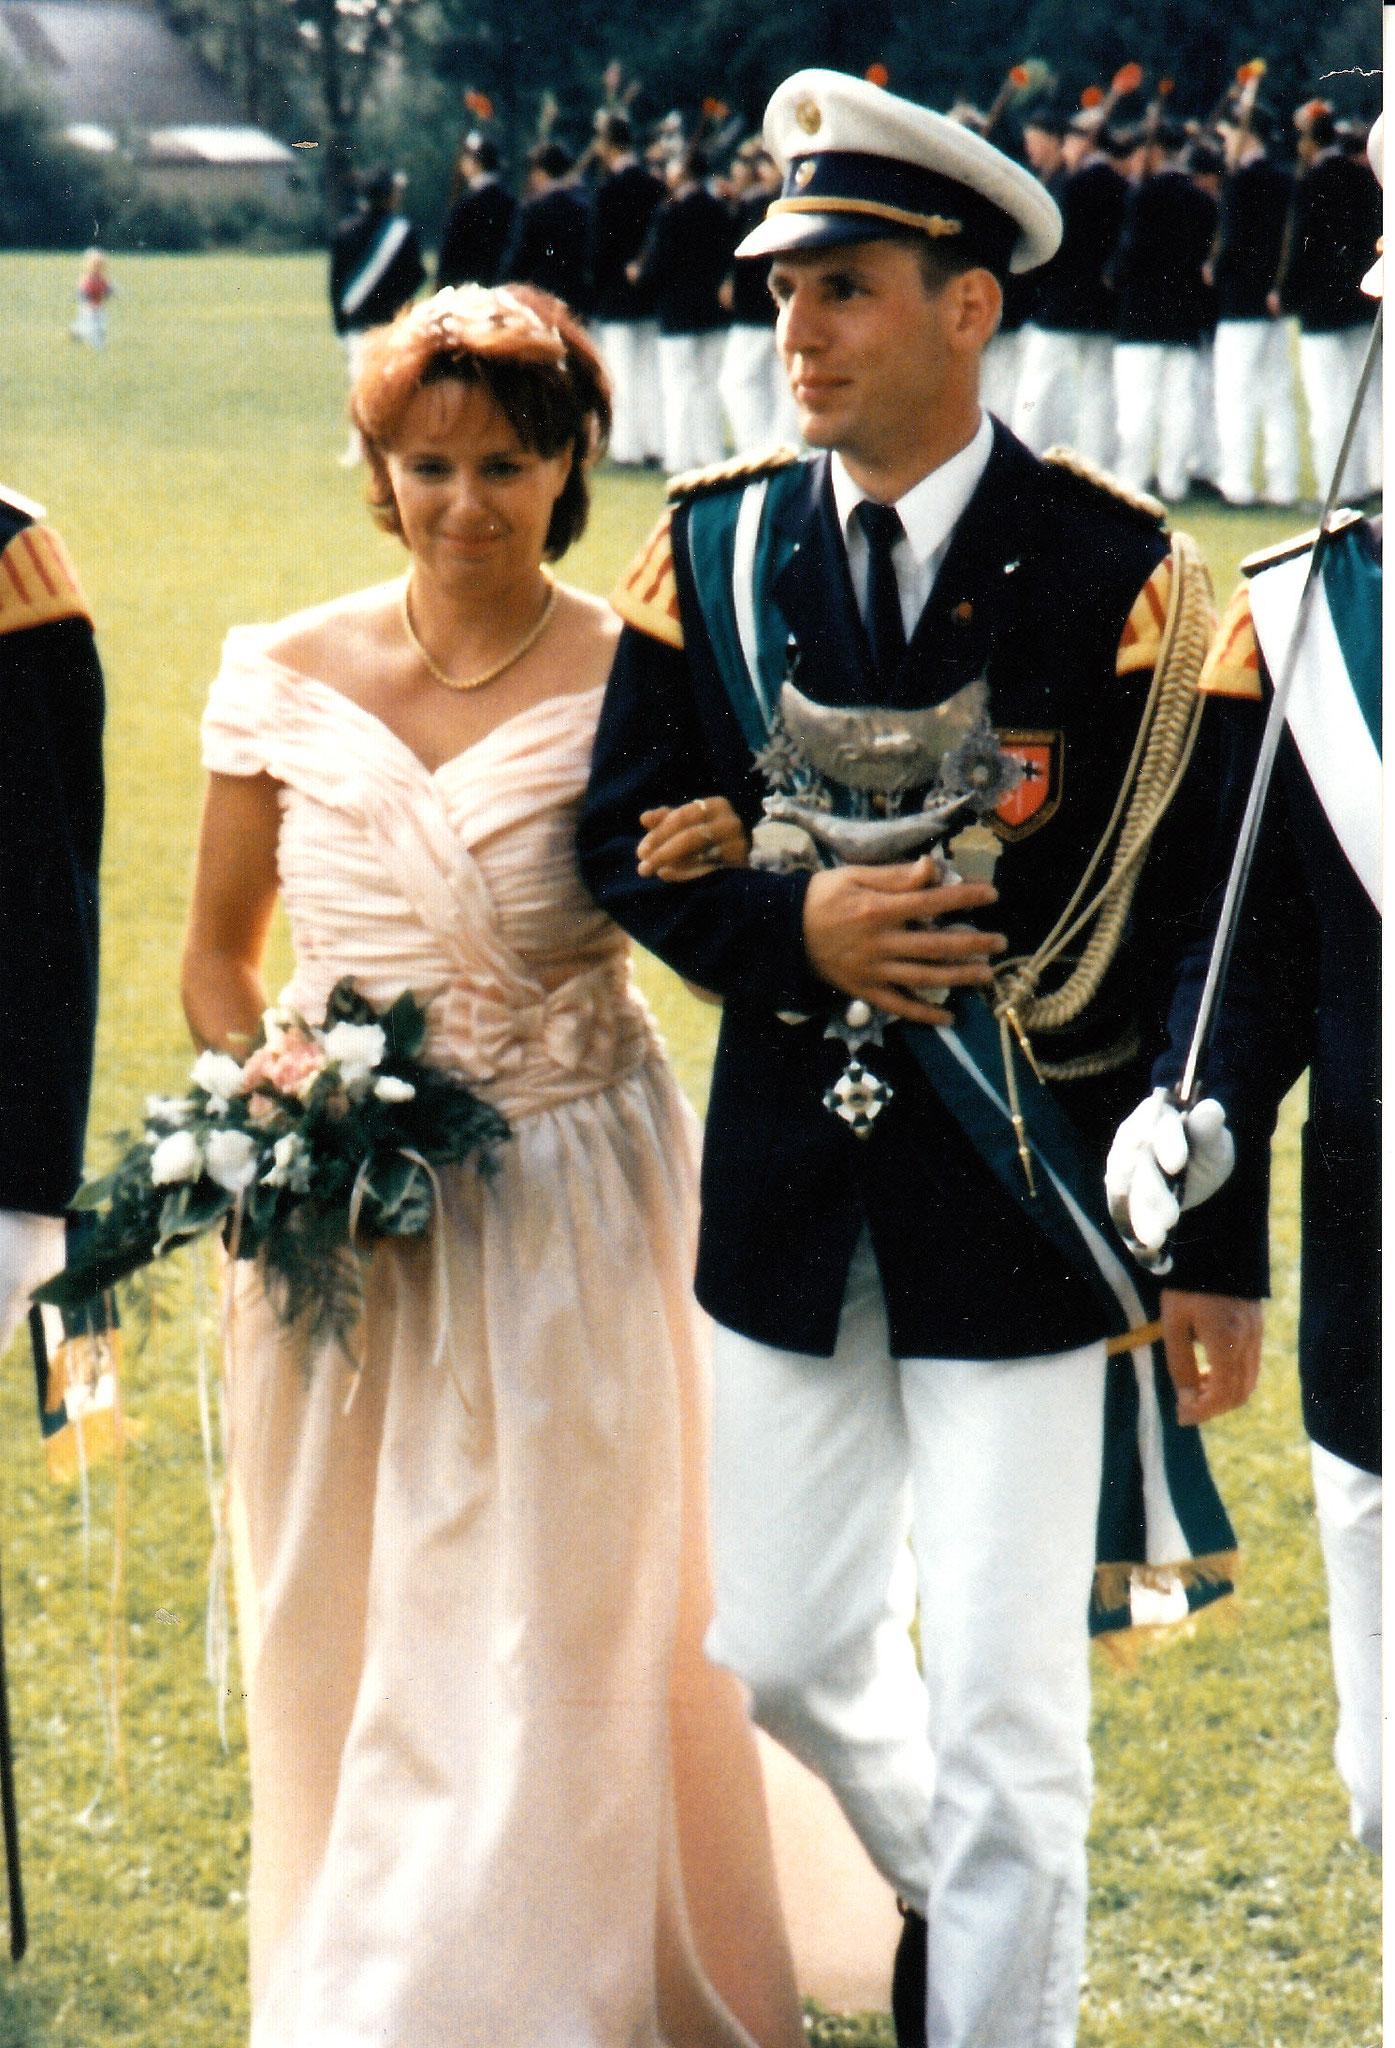 1996 Dirk Romberg & Kathrin Korff